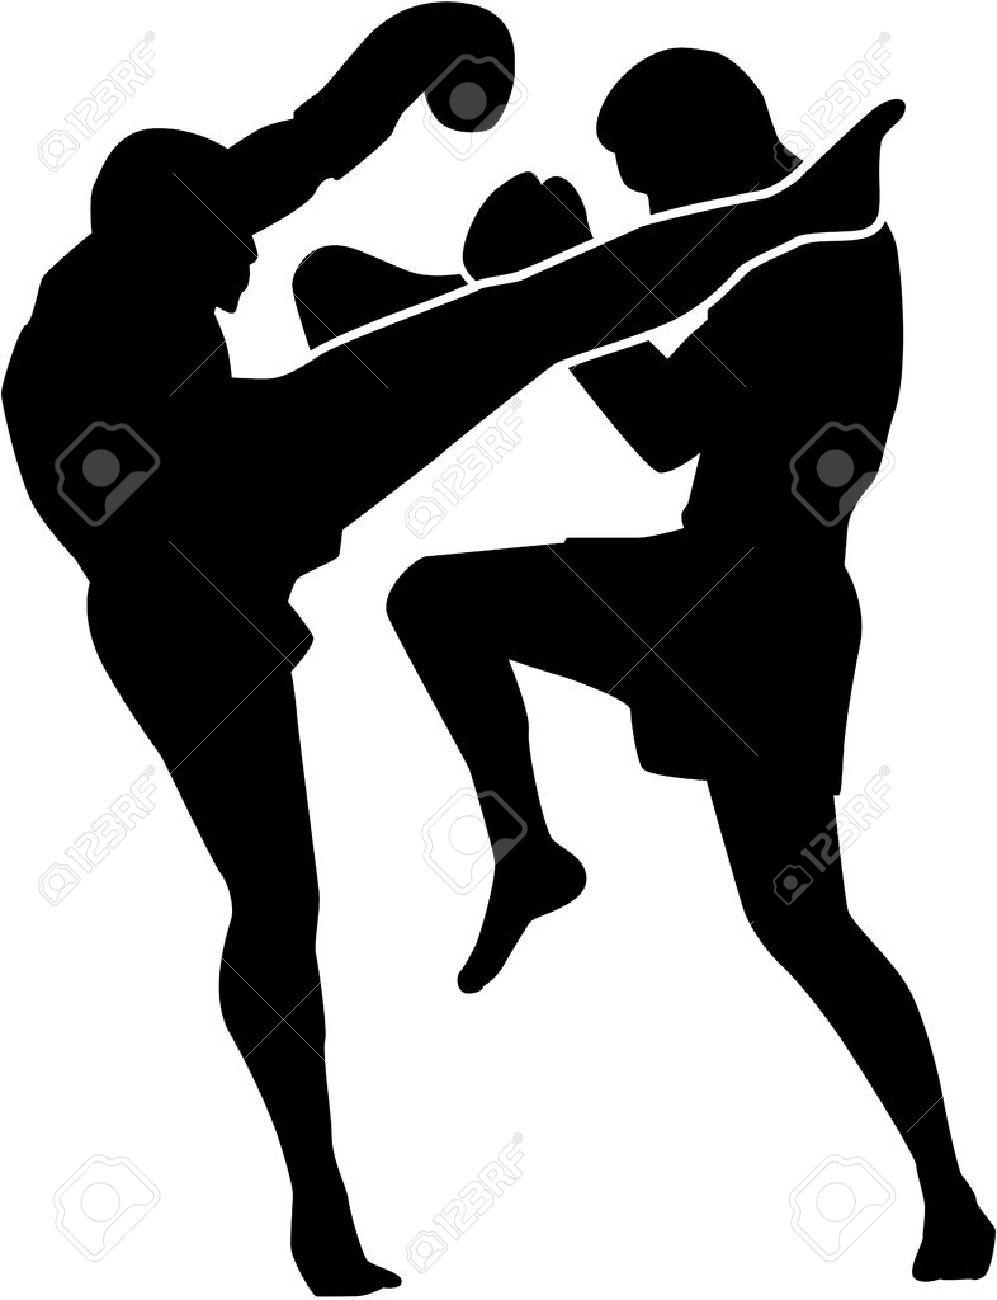 Muay Thai fighter - 51818609